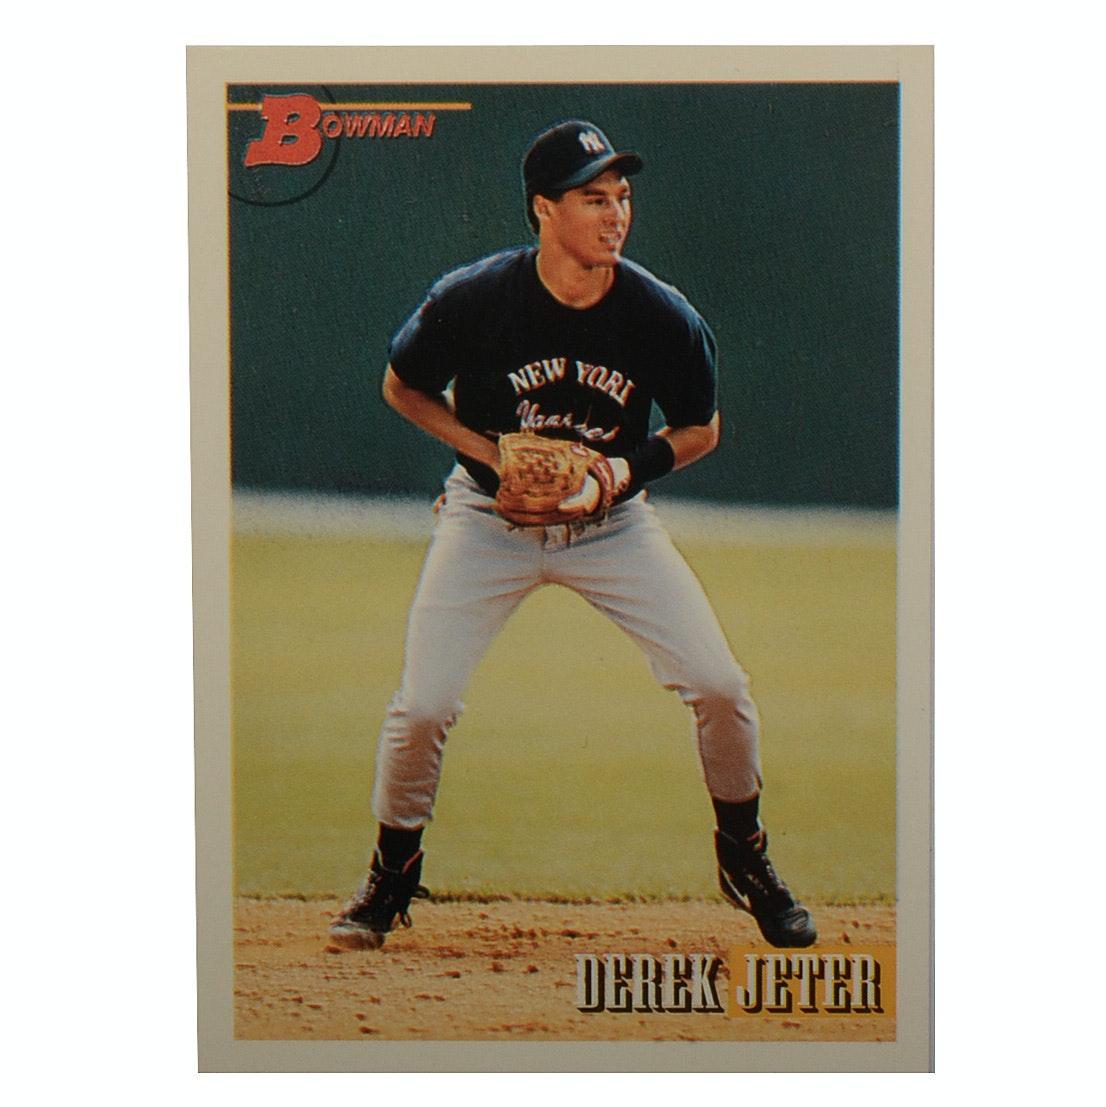 1993 Derek Jeter Yankees Bowman Rookie Baseball Card